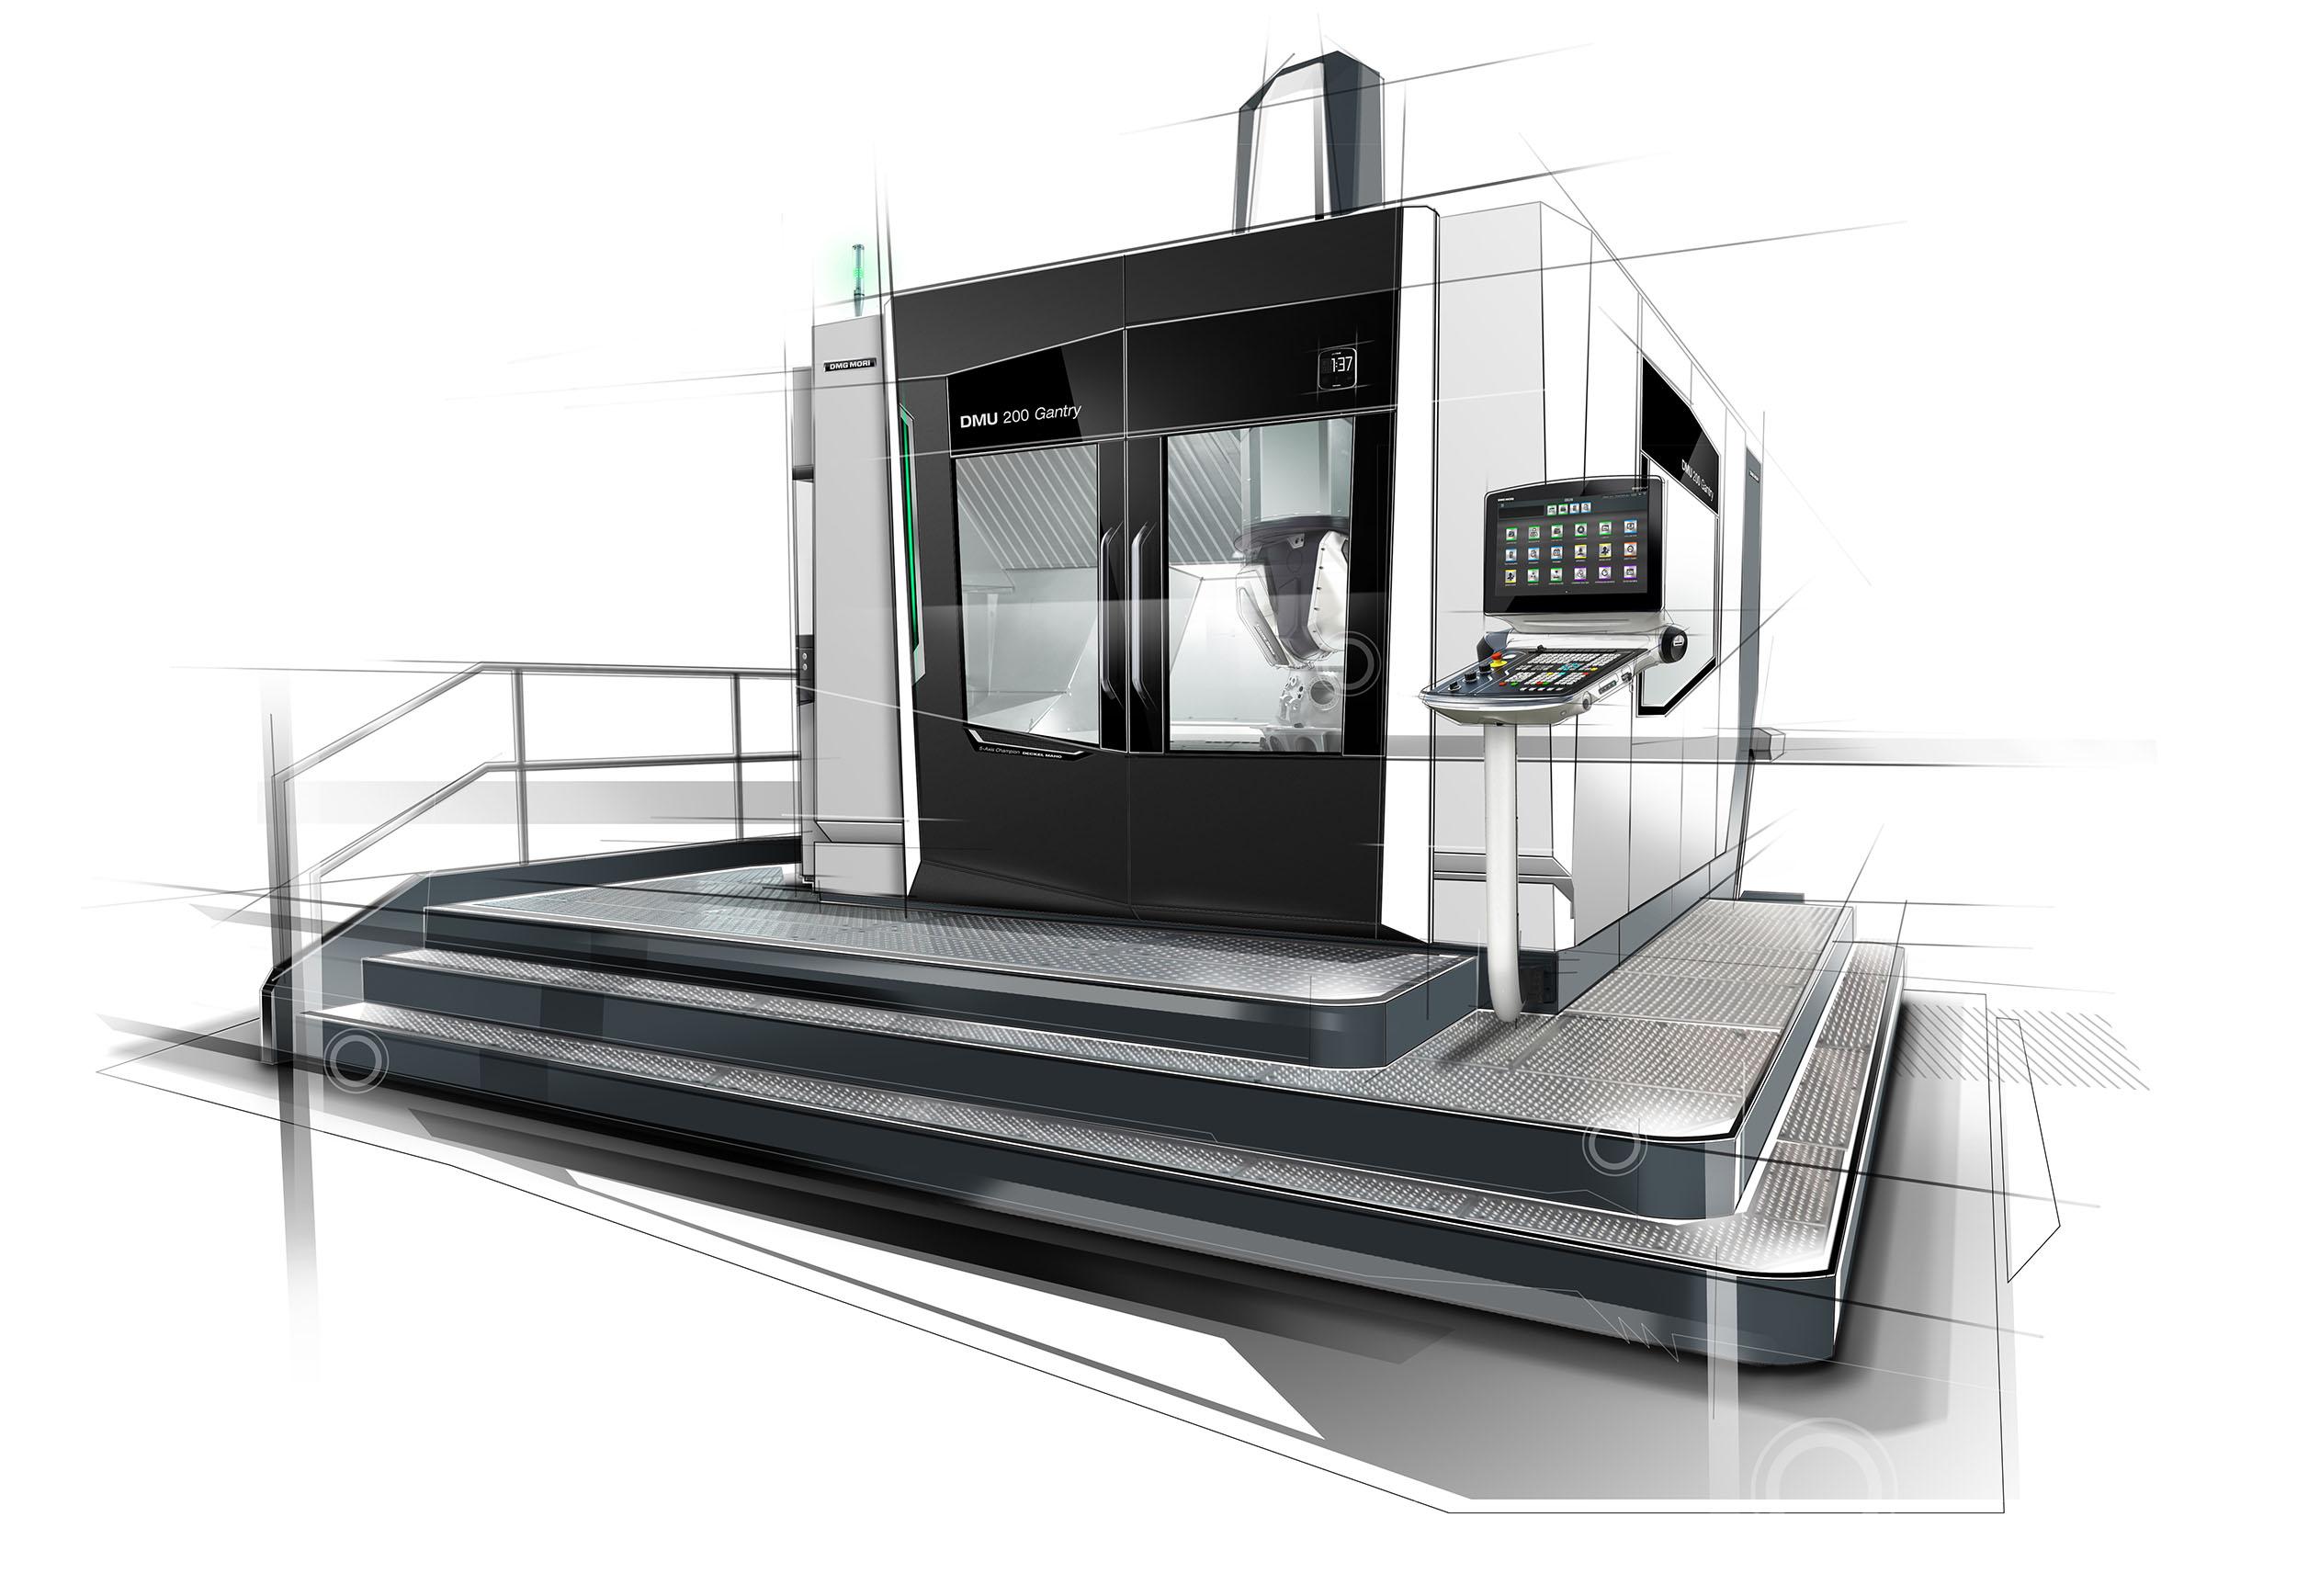 Gantry Milling Machine, Source: DMG Mori